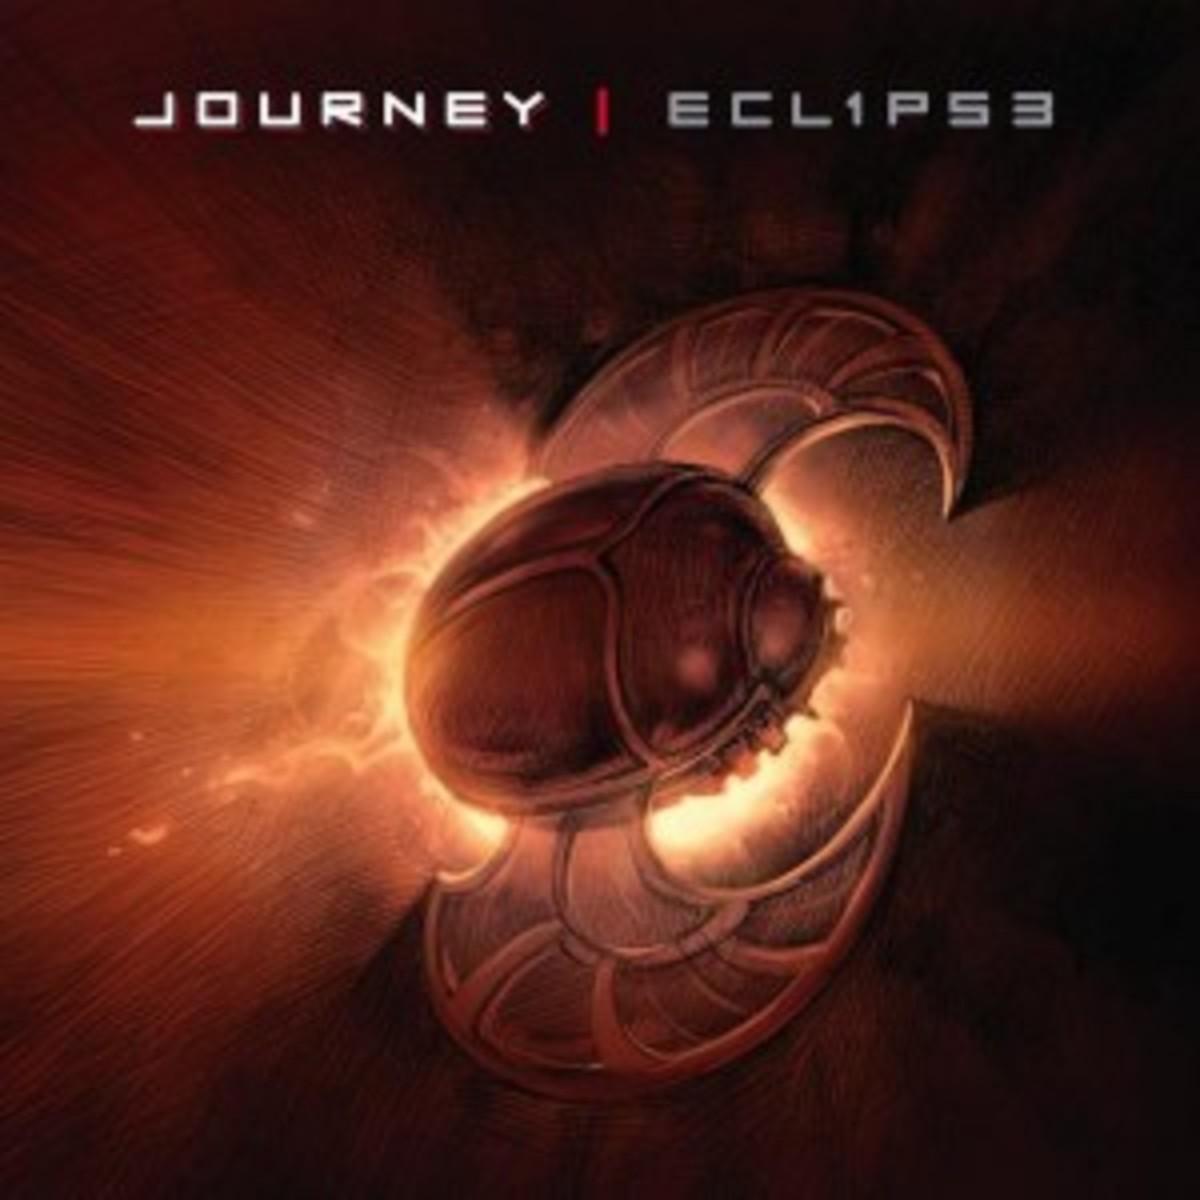 Journey Eclipse album